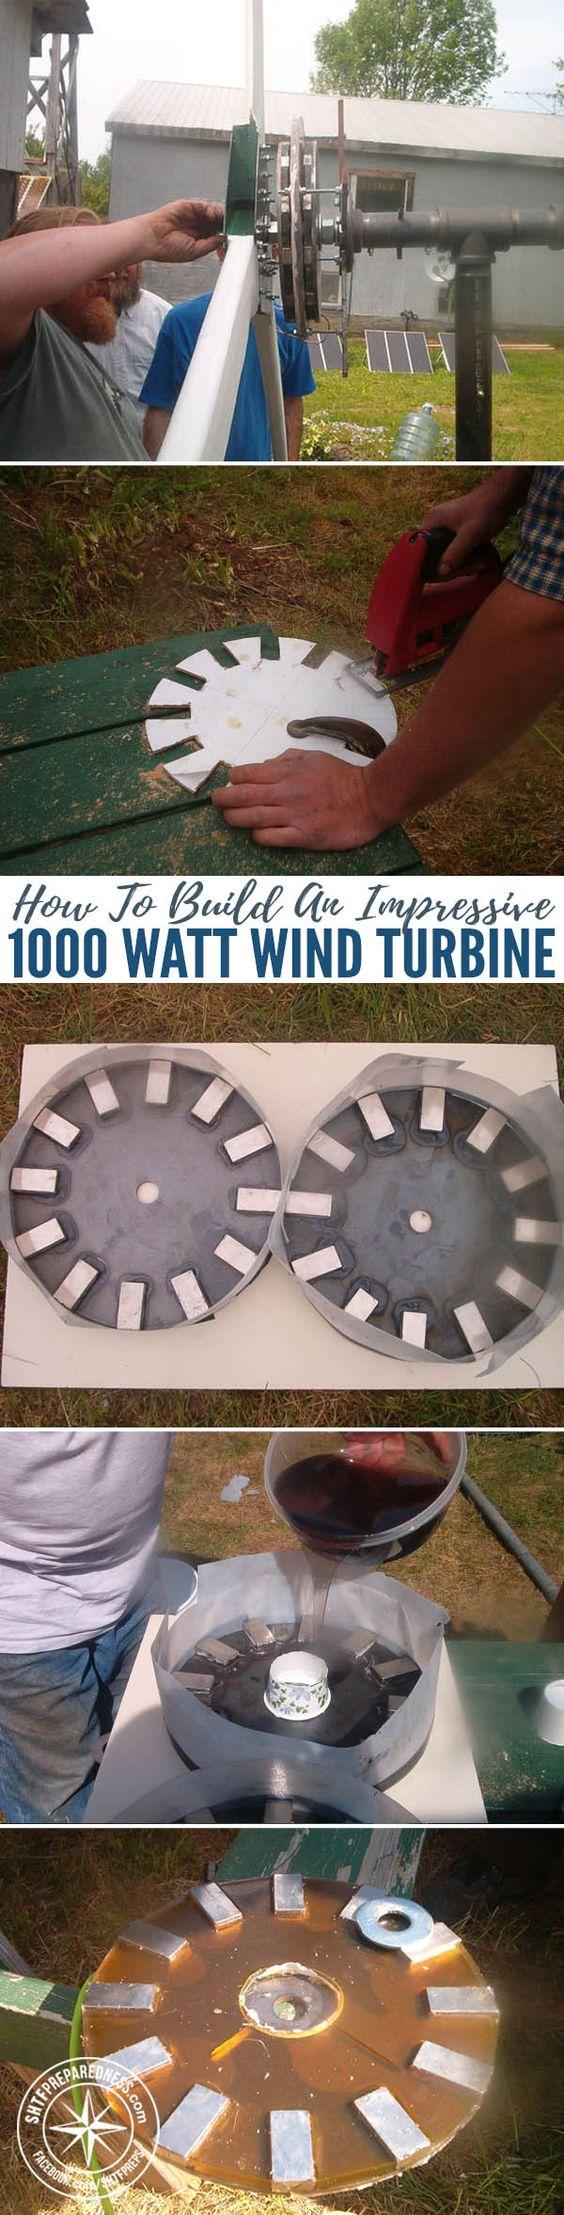 Off Grid Power The DIY 1000 Watt Wind Turbine Wind